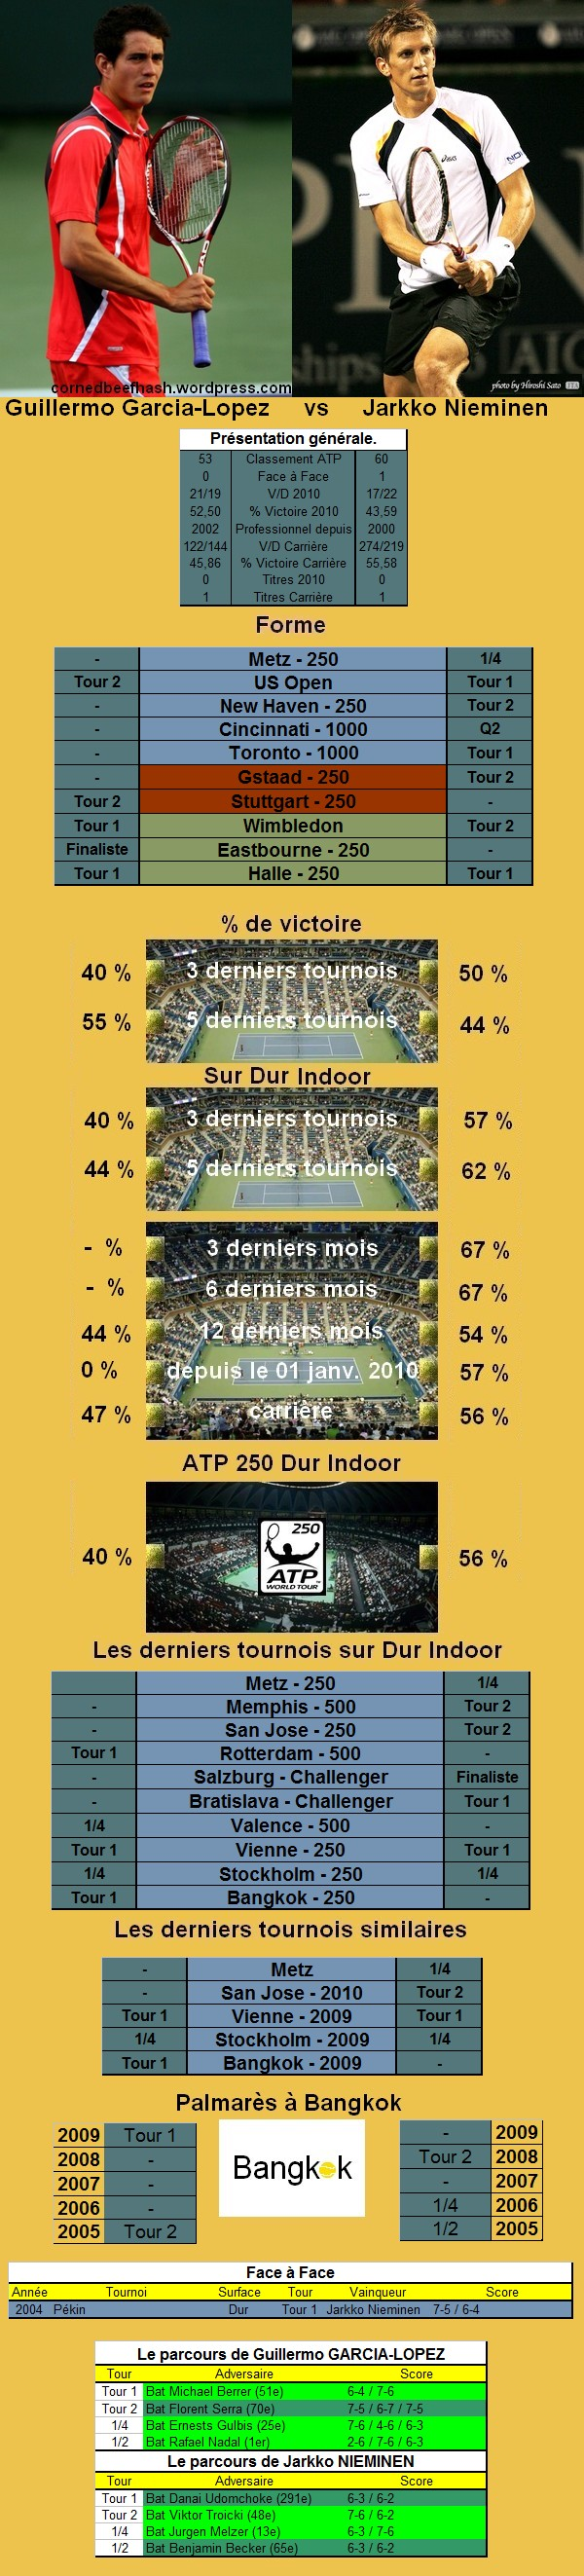 Statistiques tennis de Garcia Lopez contre Nieminen à Bangkok